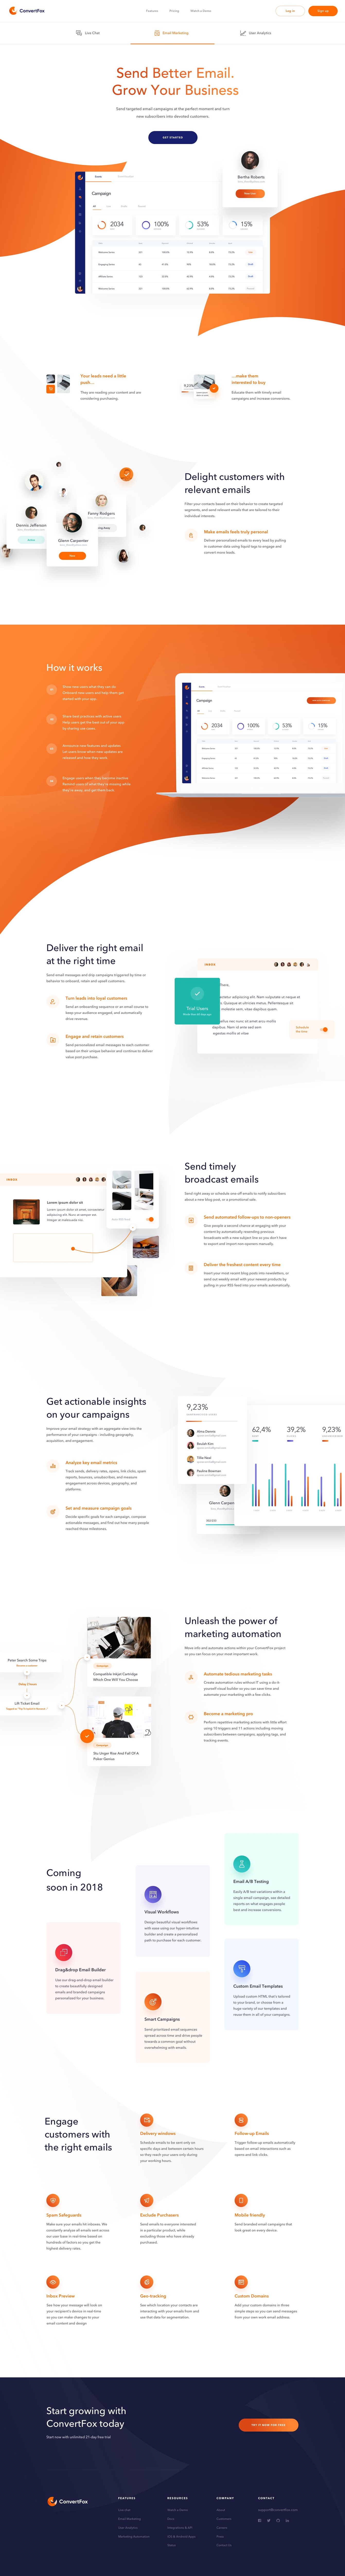 Convertfox website email marketing